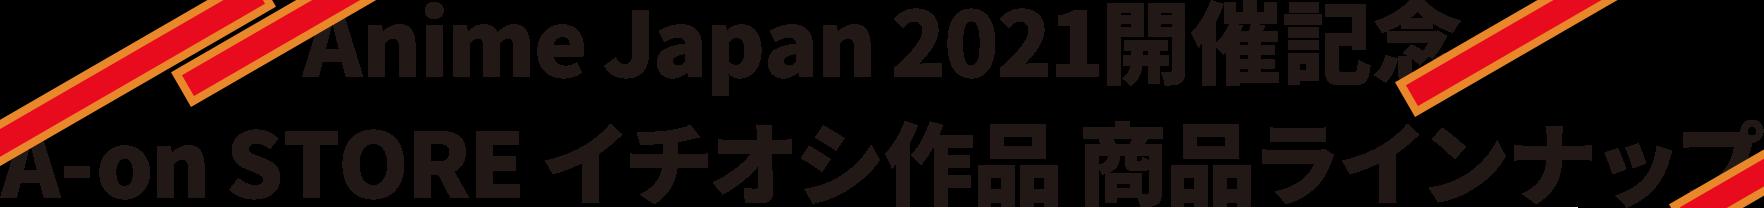 Anime Japan 2021開催記念 A-on STORE イチオシ作品 商品ラインナップ